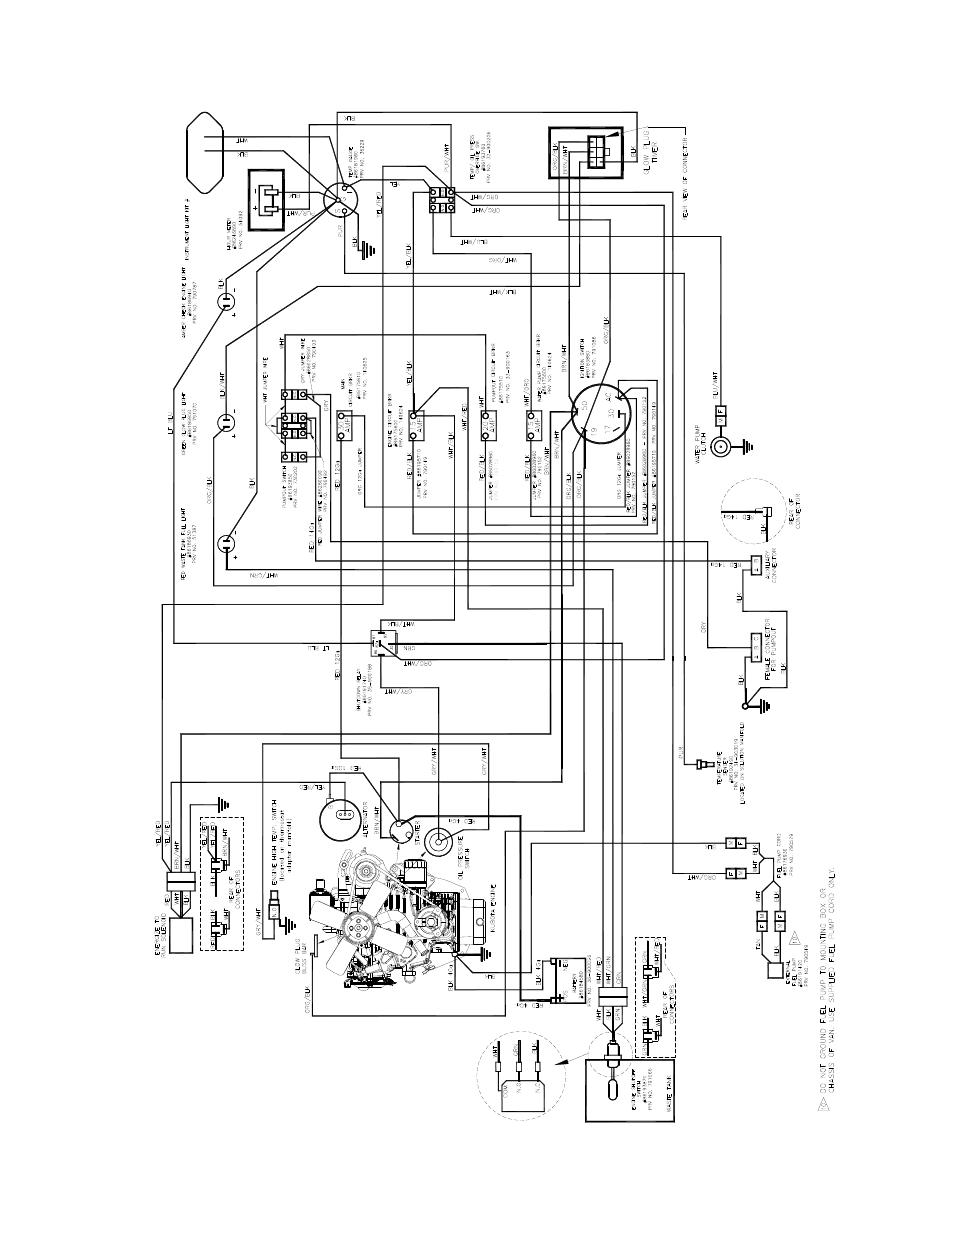 [DIAGRAM] John Deere 145 Wiring Diagram Wiring Diagram